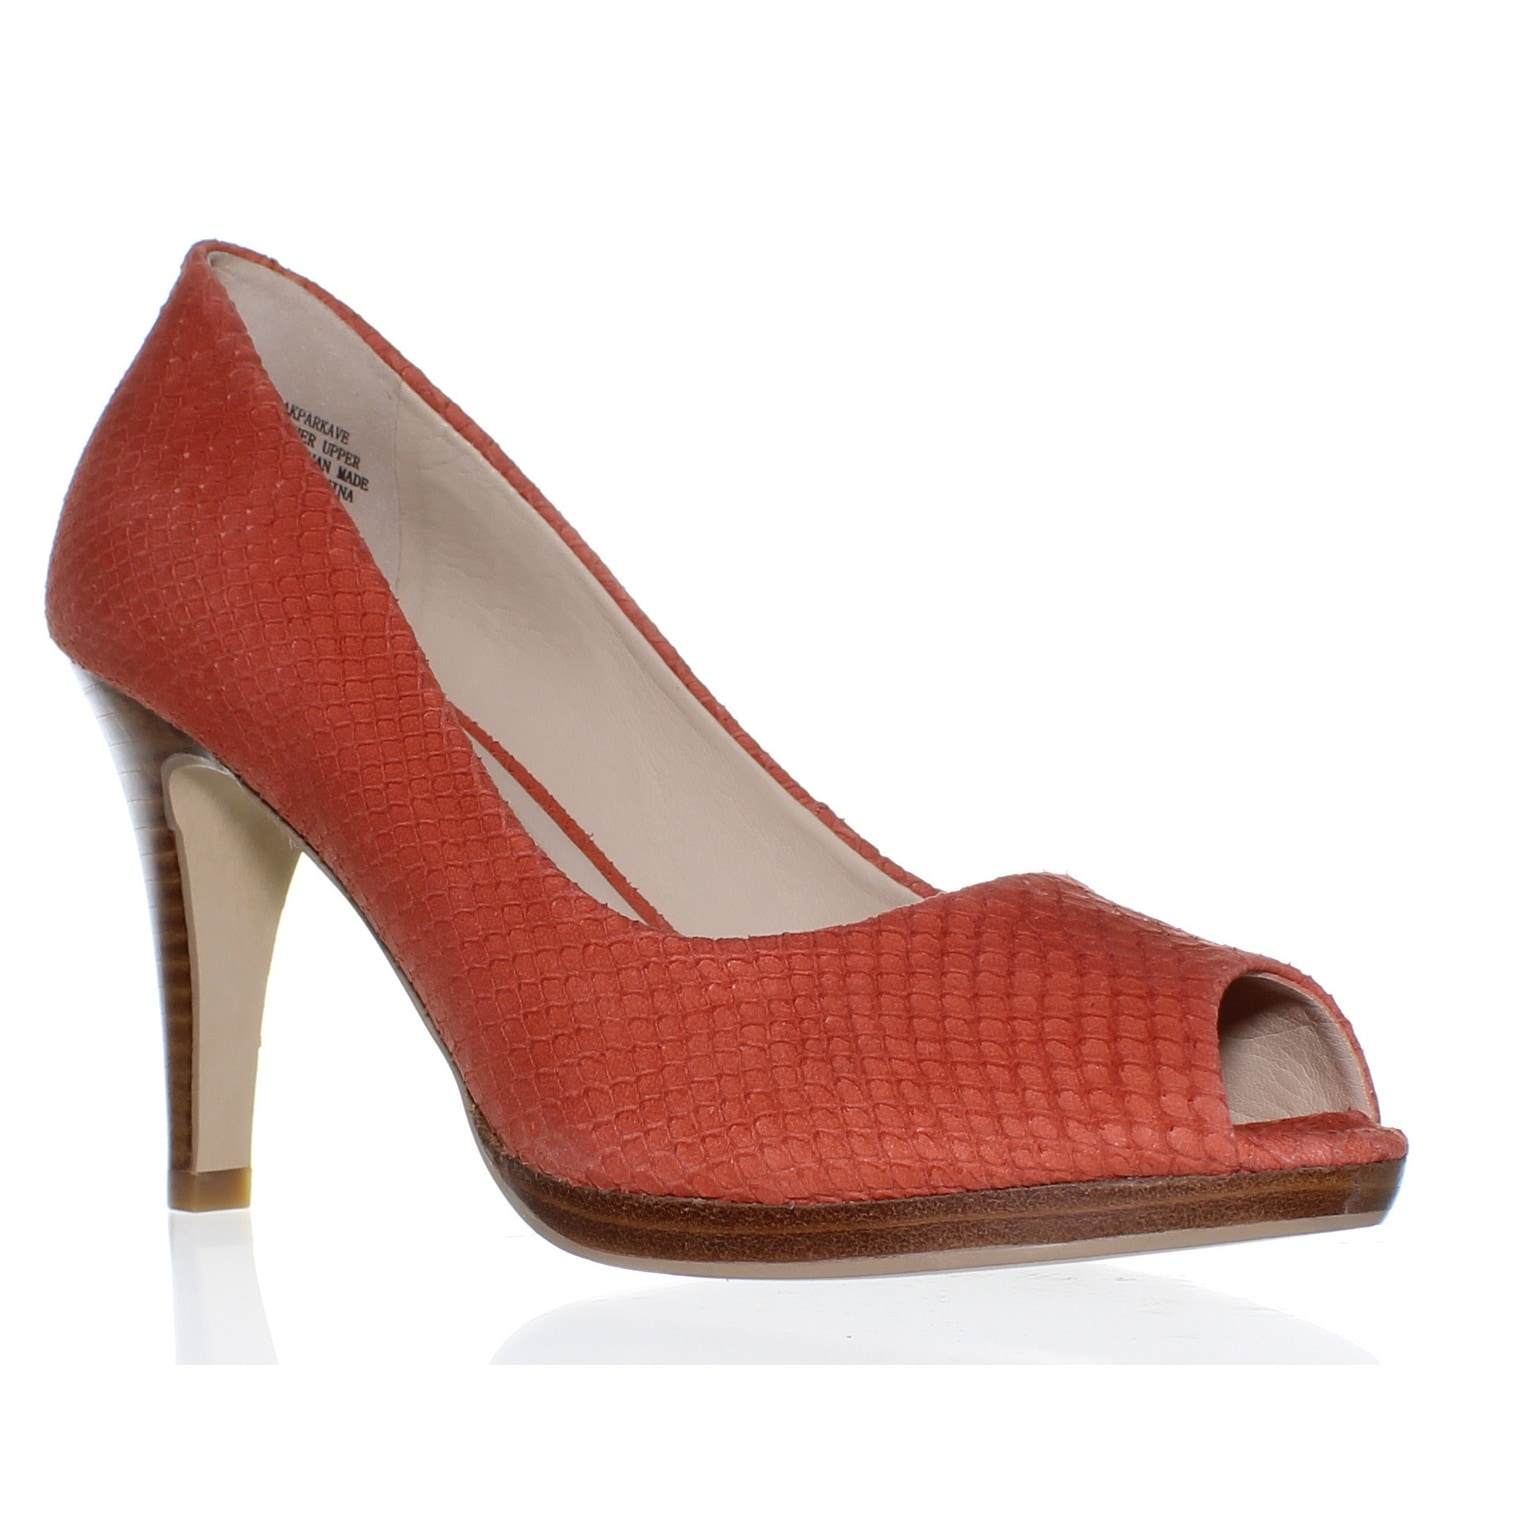 264a0160aedd Red Anne Klein Women s Shoes